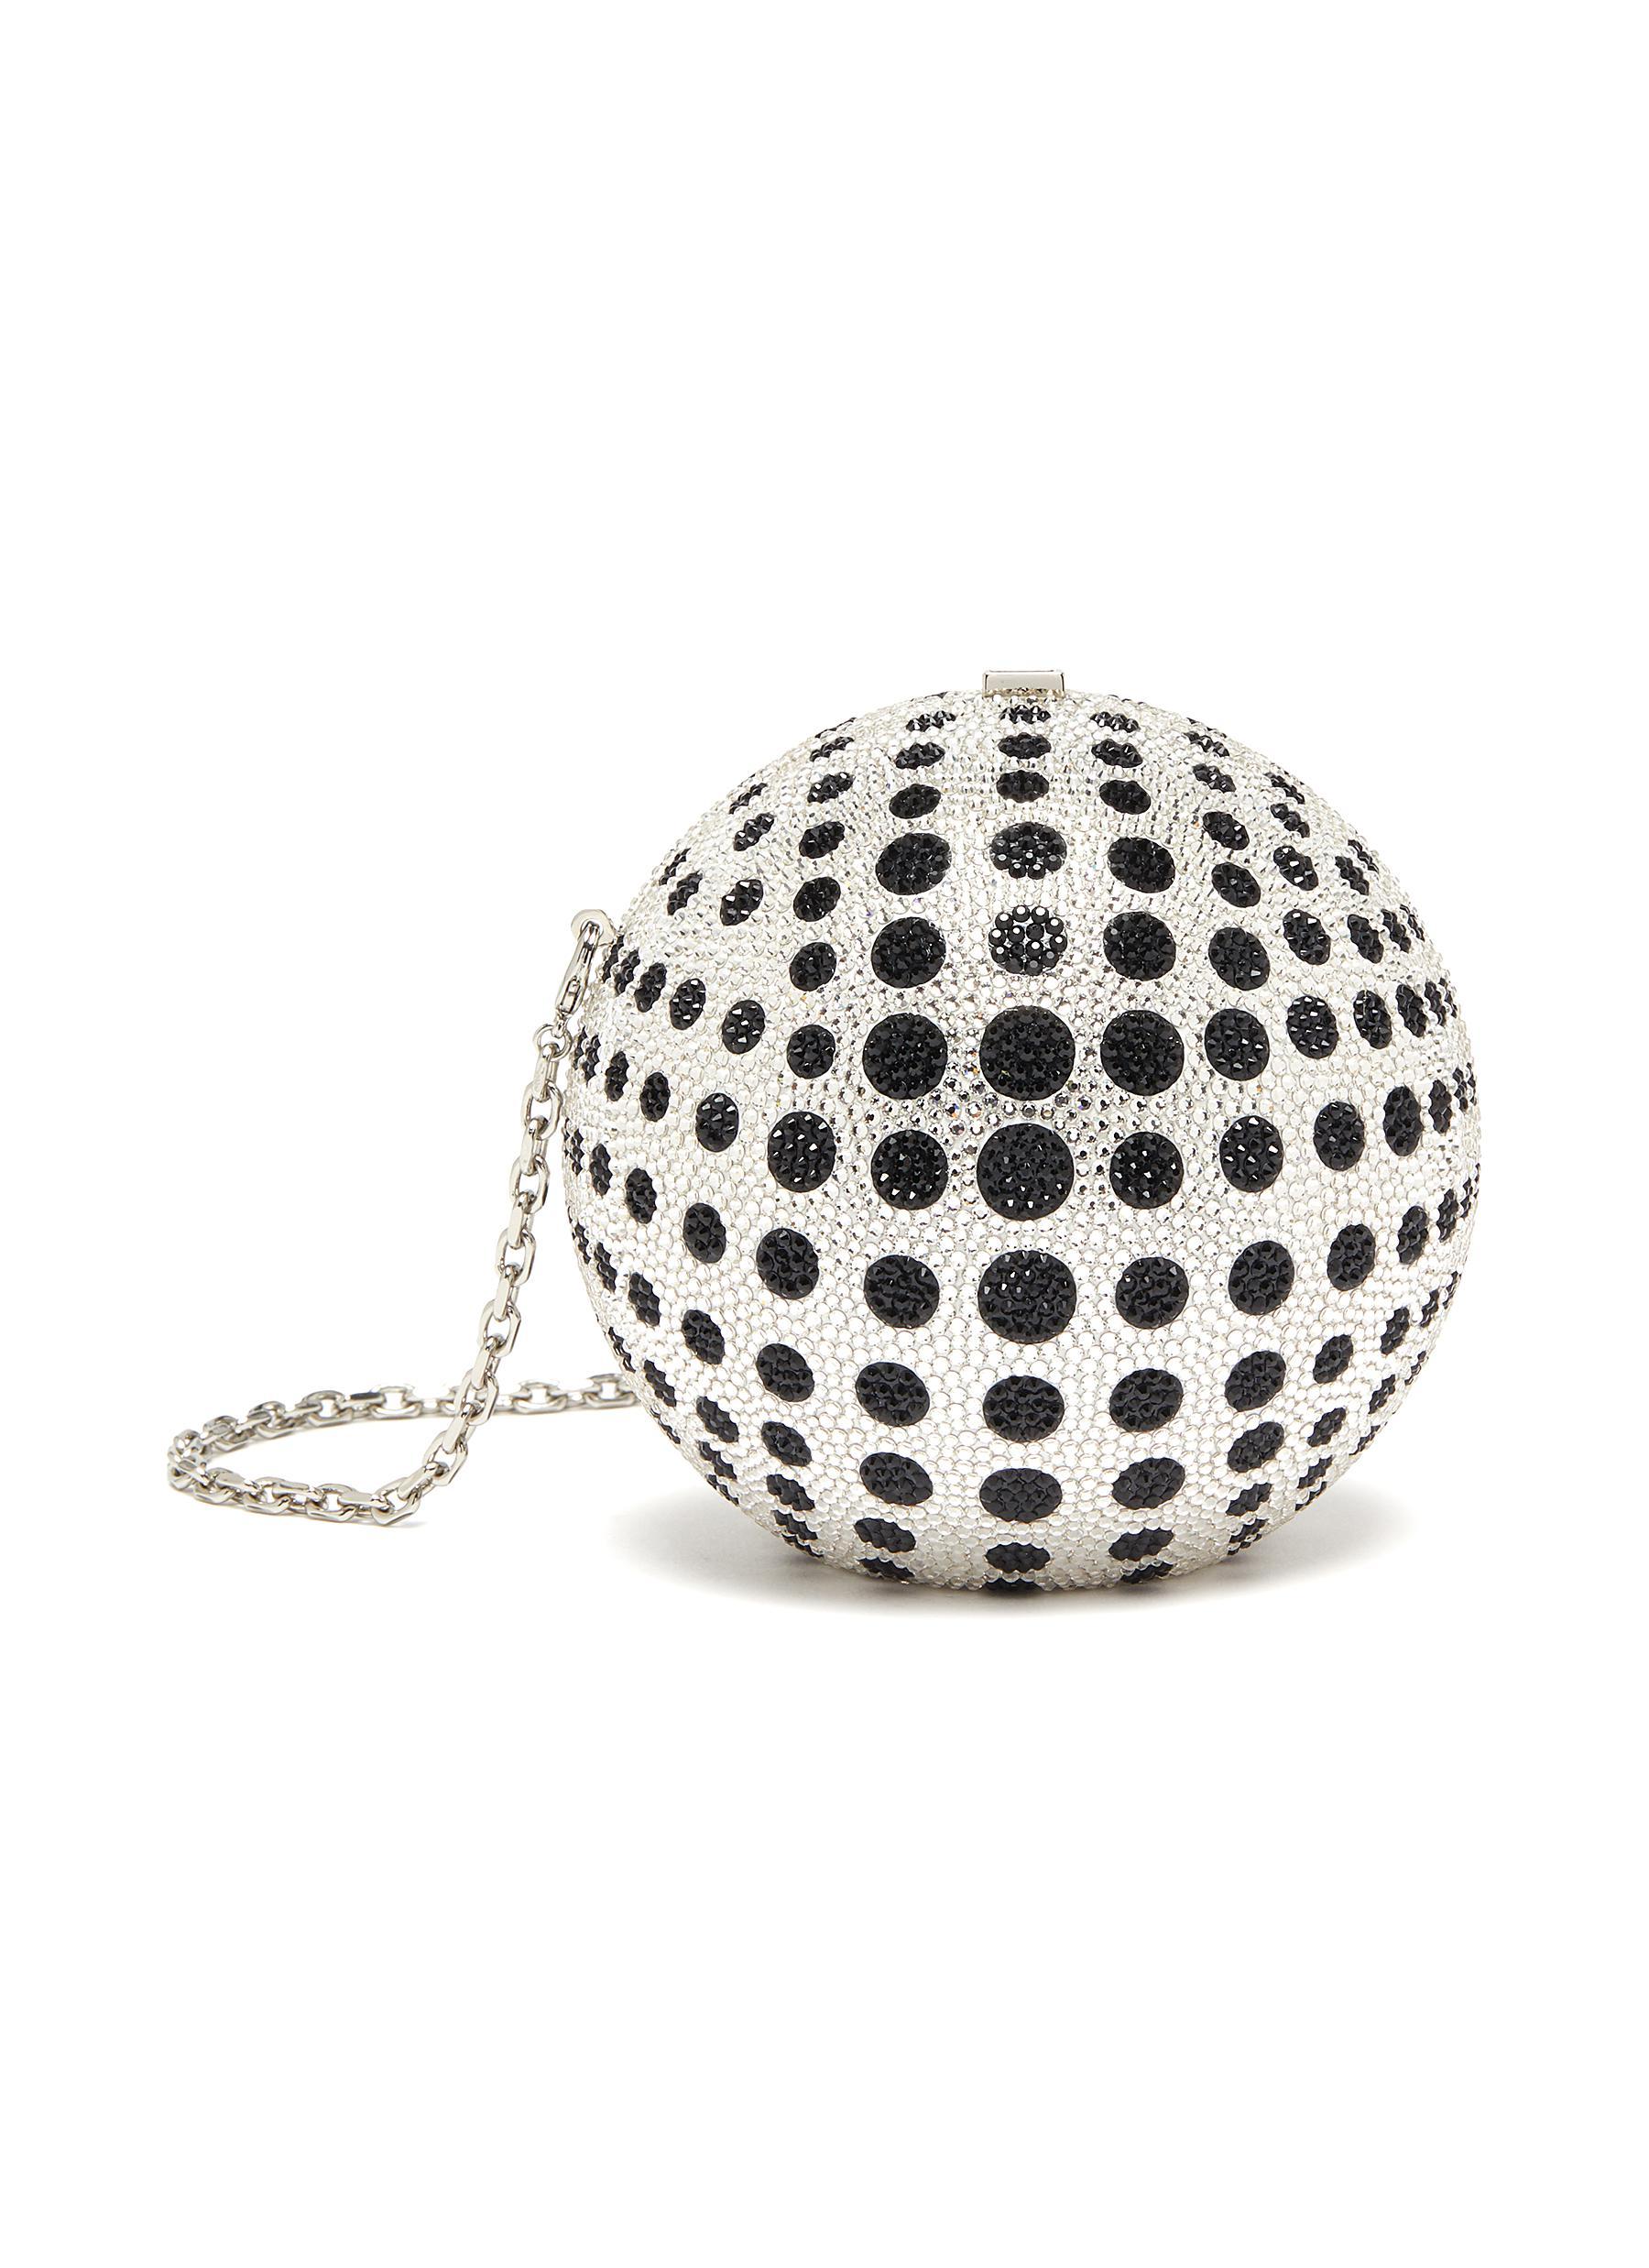 In Orbit Sphere' Polka Dot Crystal Embellished Bag